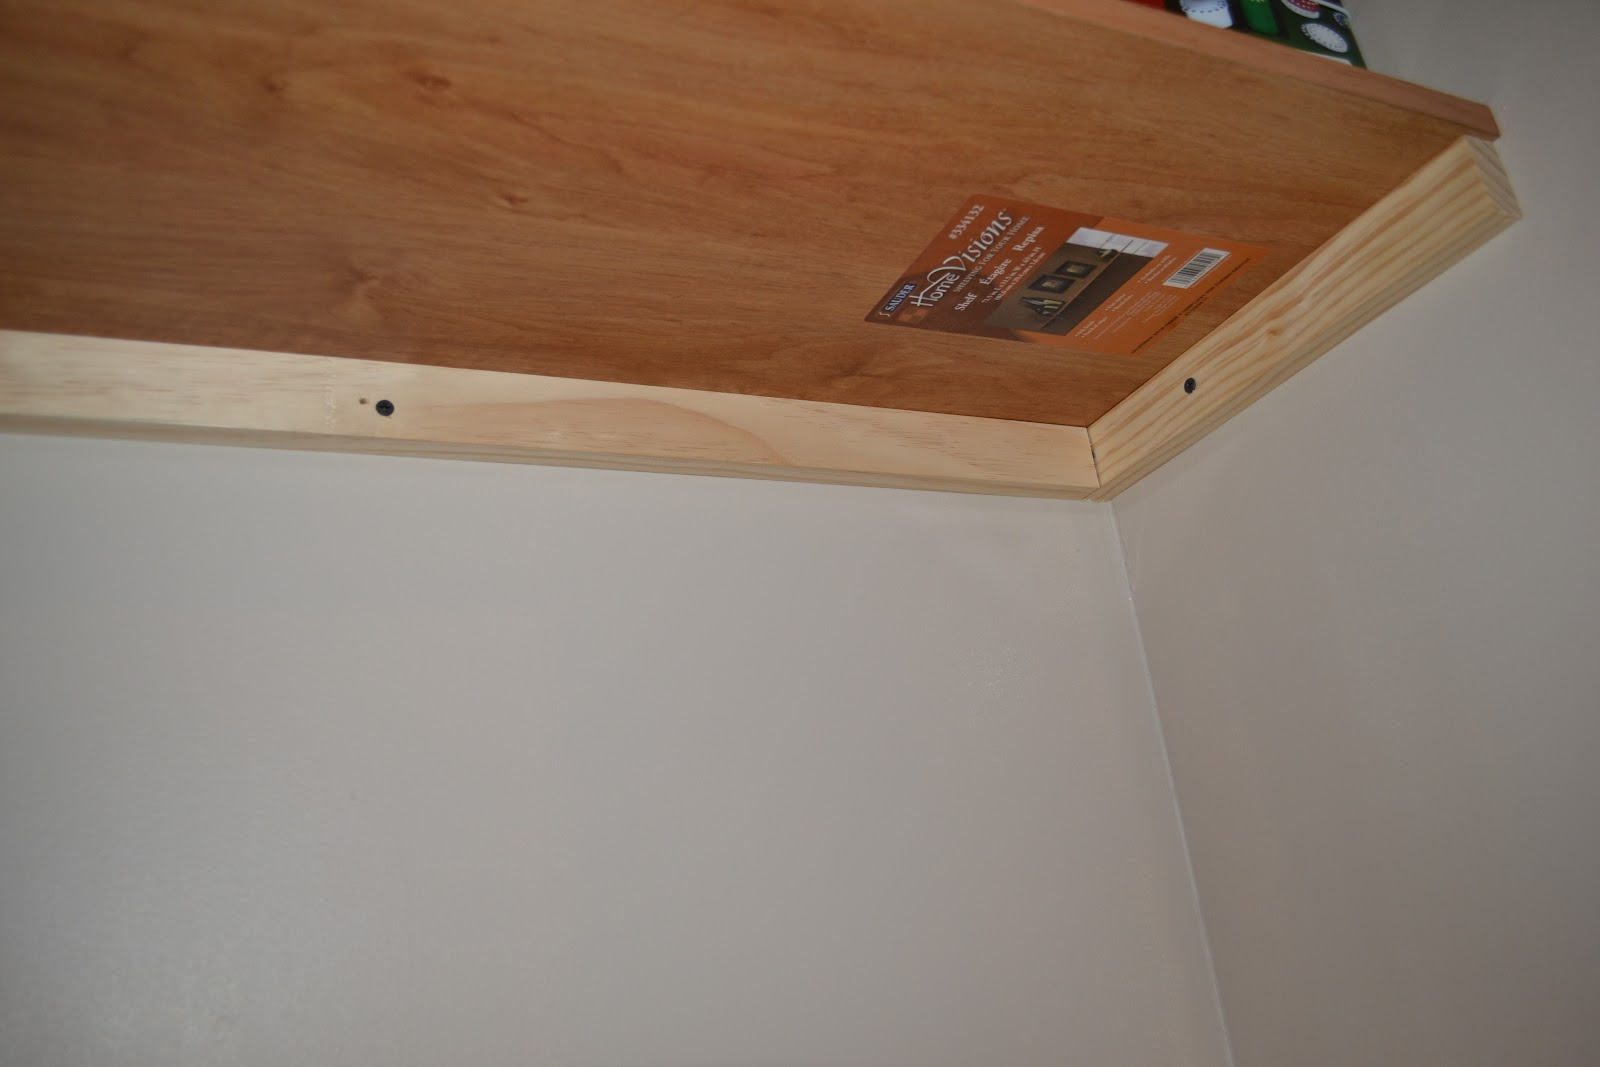 Bench Guide: Access Build bracketless shelves